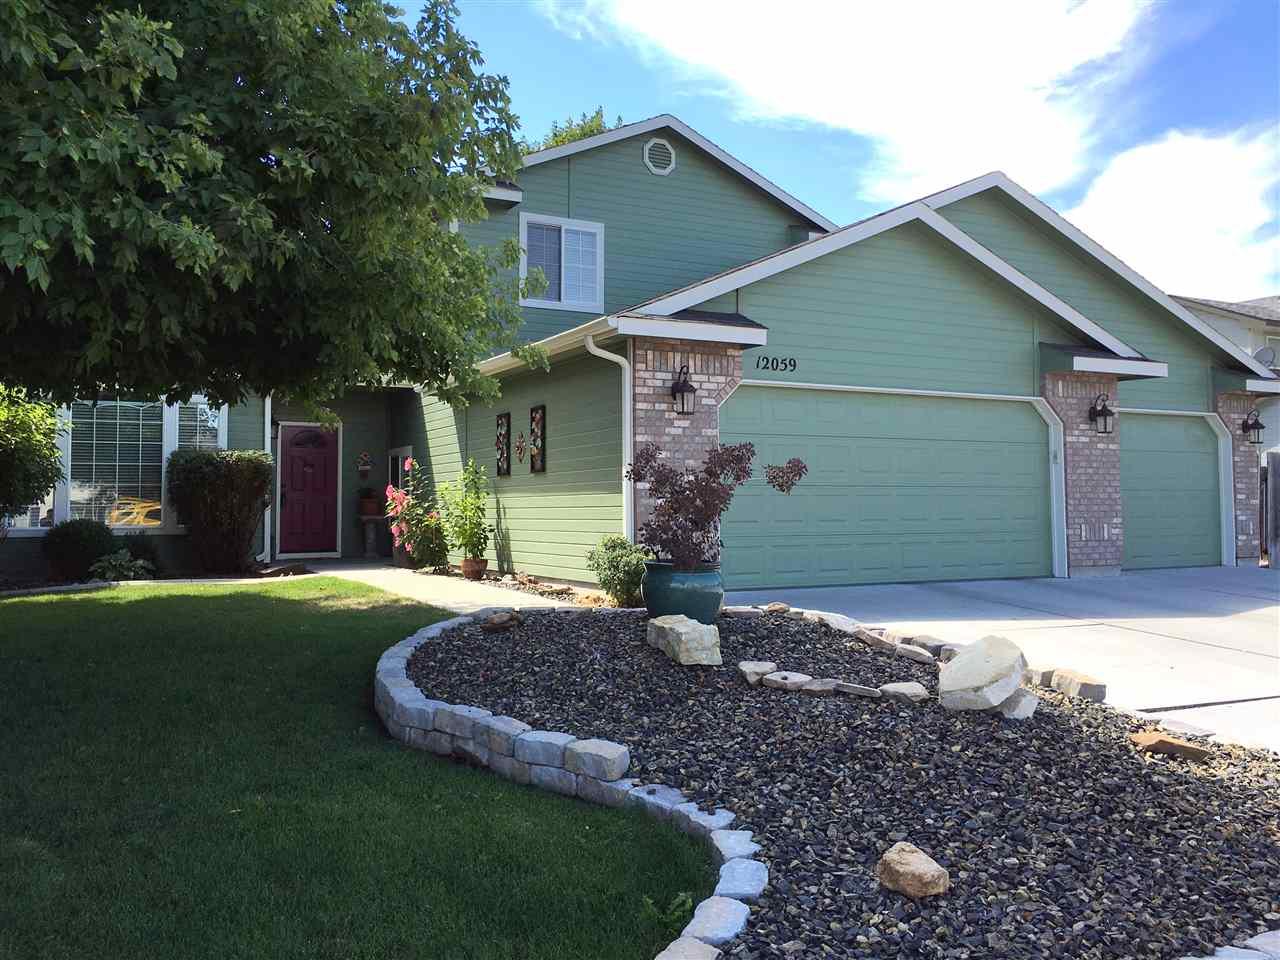 12059 W Blueberry, Boise, ID 83709